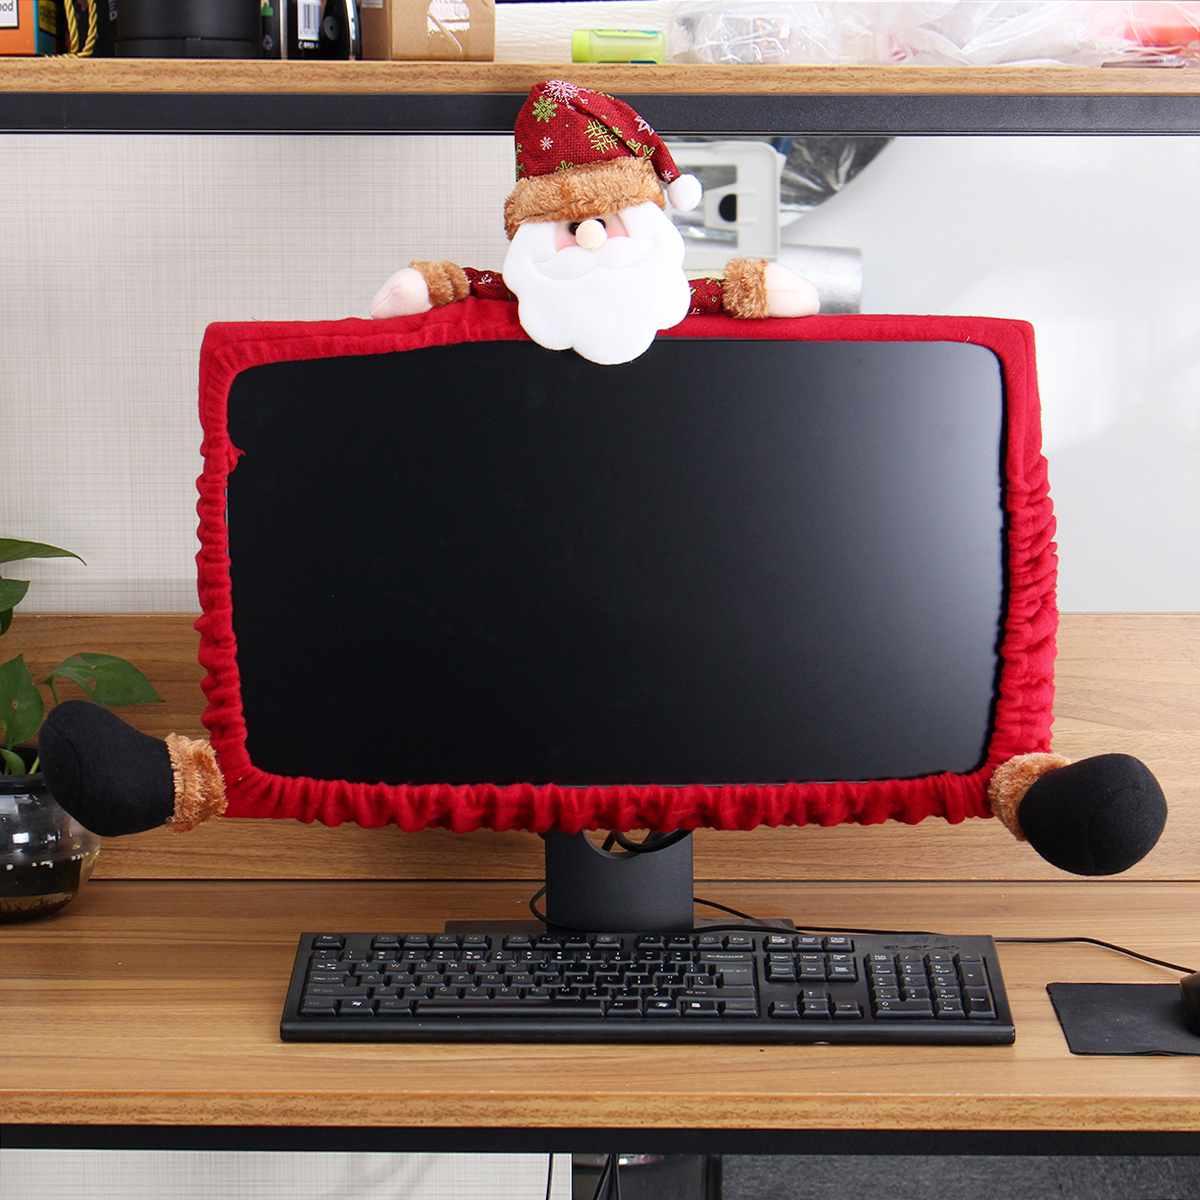 Xmas Computer LCD Monitor Border Cover Screen Edge Protect Christmas Decor Festive Holiday Ornaments Party Supplies Home Decor